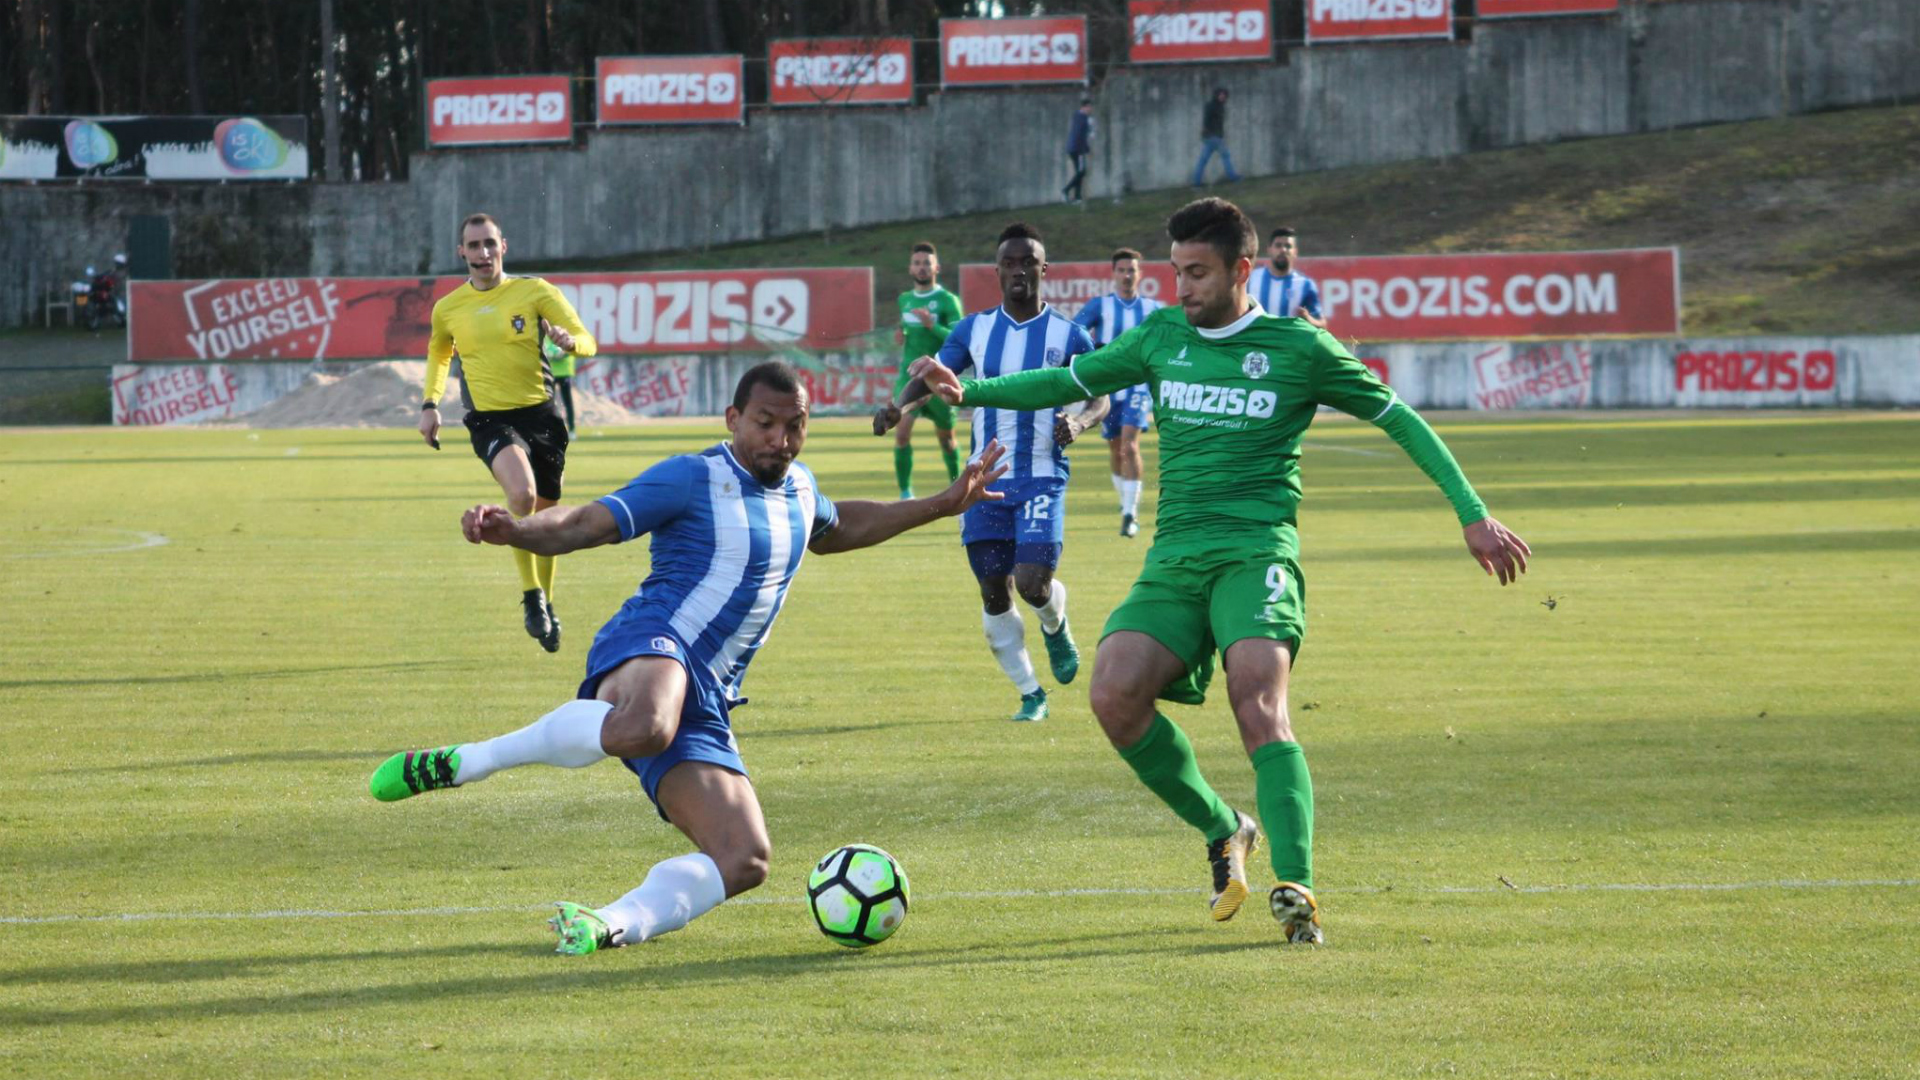 Vilaverdense, Vizela, Campeonato de Portugal